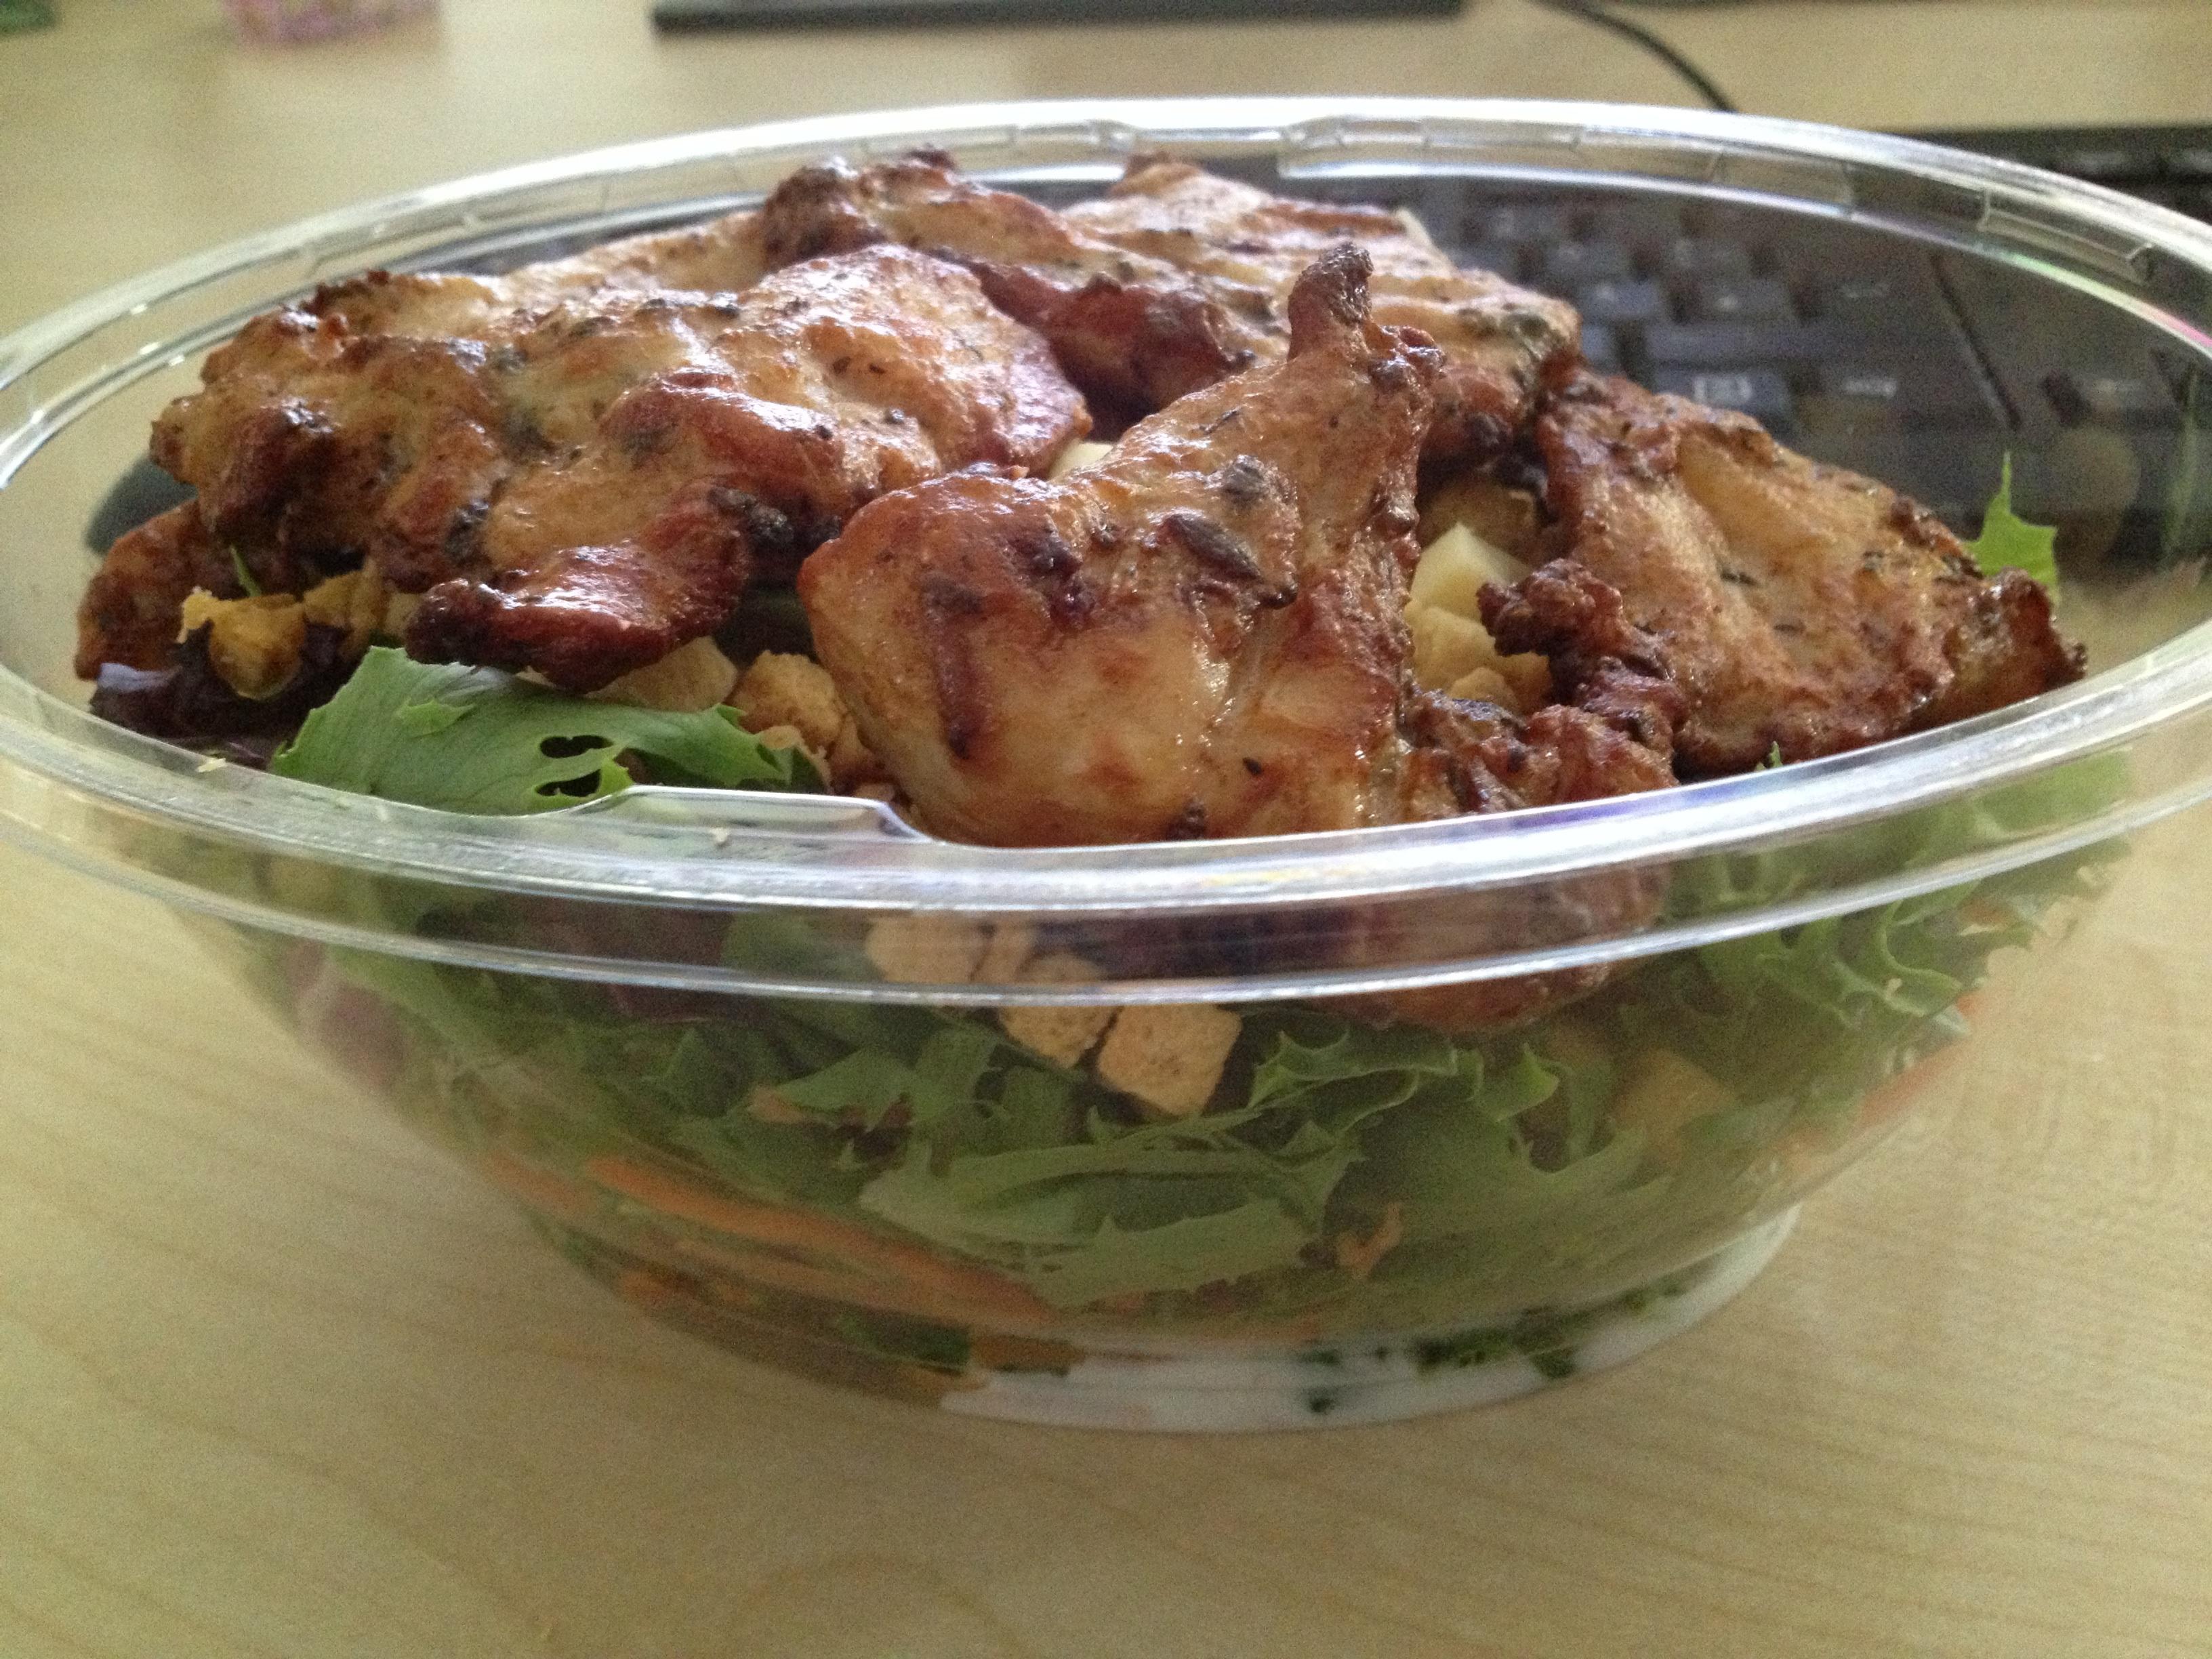 http://foodloader.net/BrollyLSSJ_2013-08-06_Trader_Joe_s_-_Frische_Salate_-_Kaese_&_Schinken_mit_Haehnchenbrust_-Filets.jpg